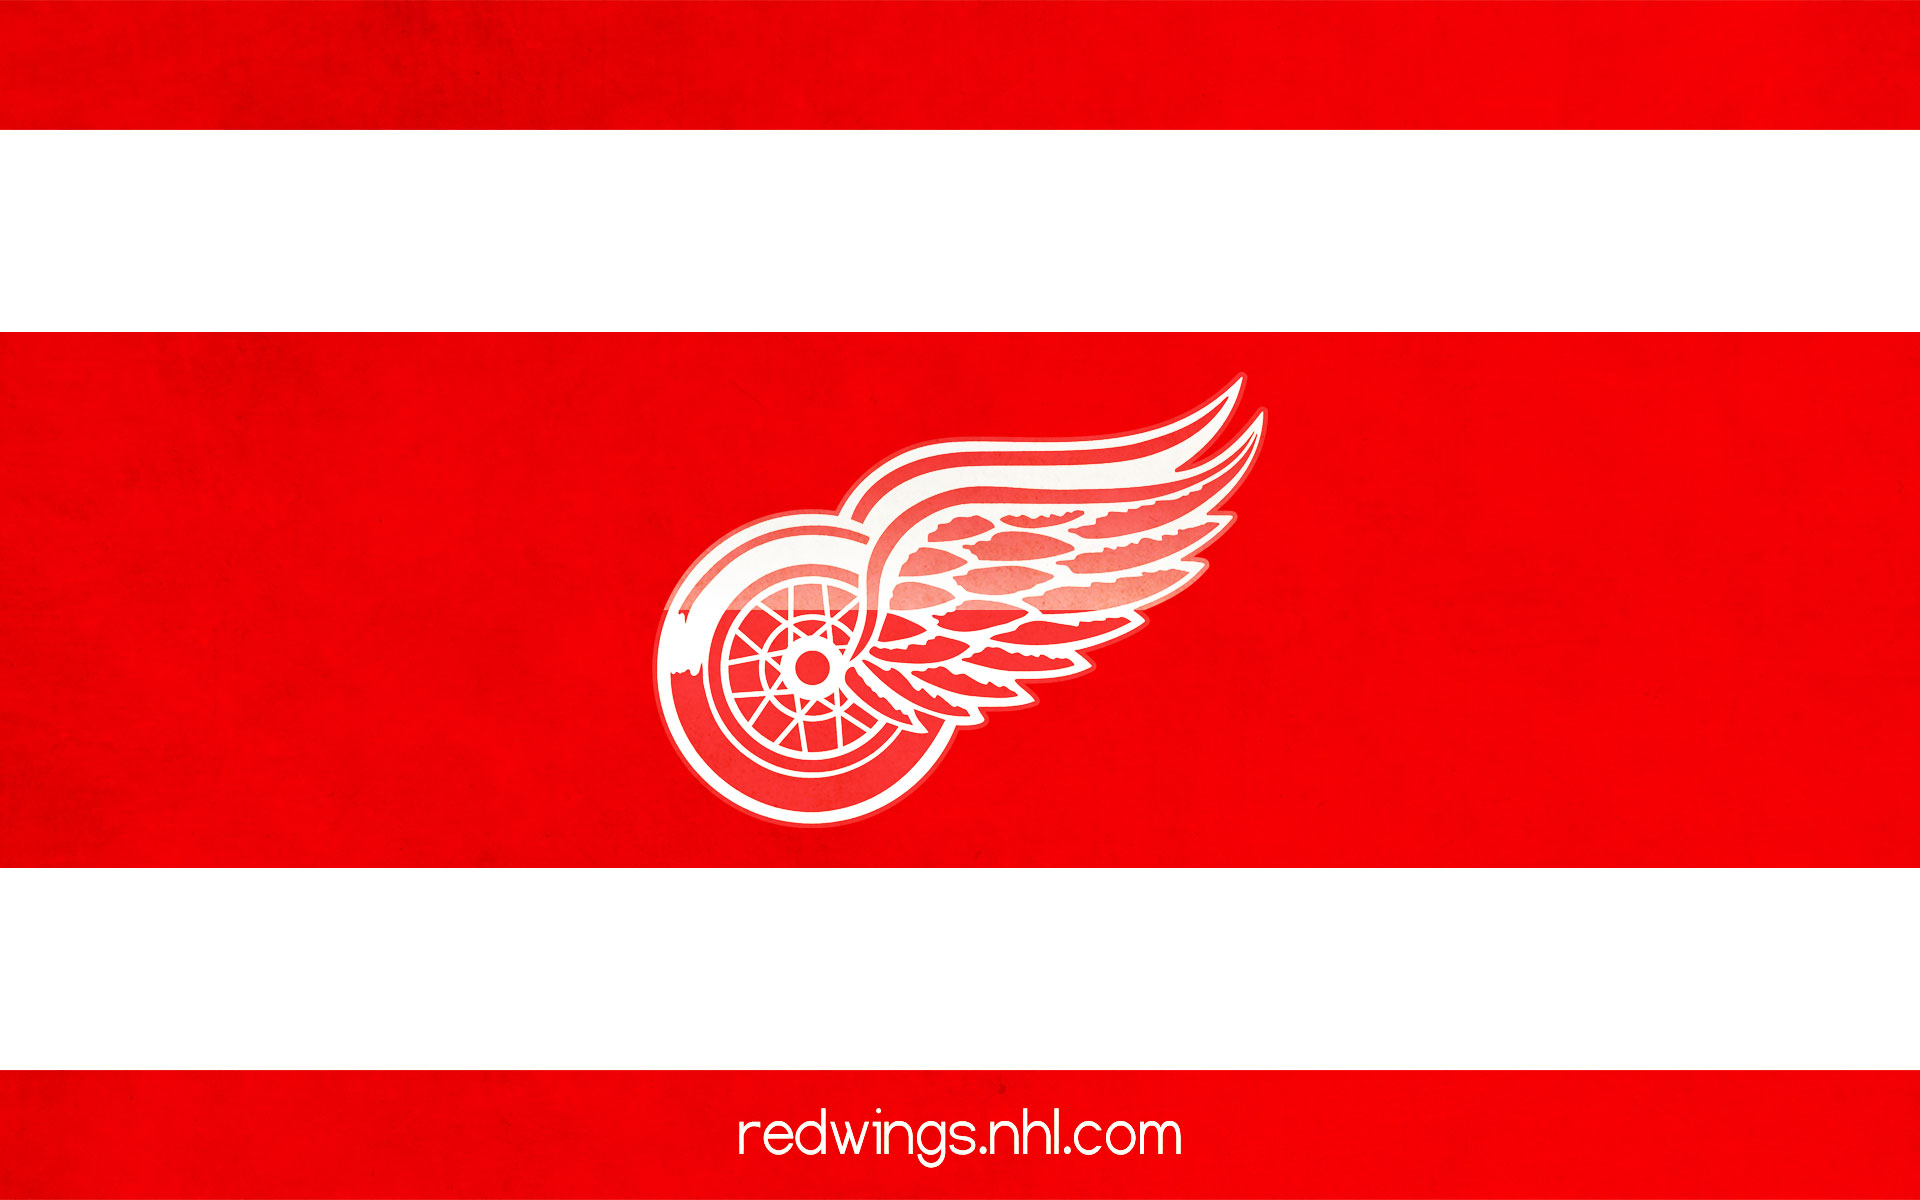 NHL Wallpapers   Detroit Red Wings Logo 1920x1200 wallpaper 1920x1200